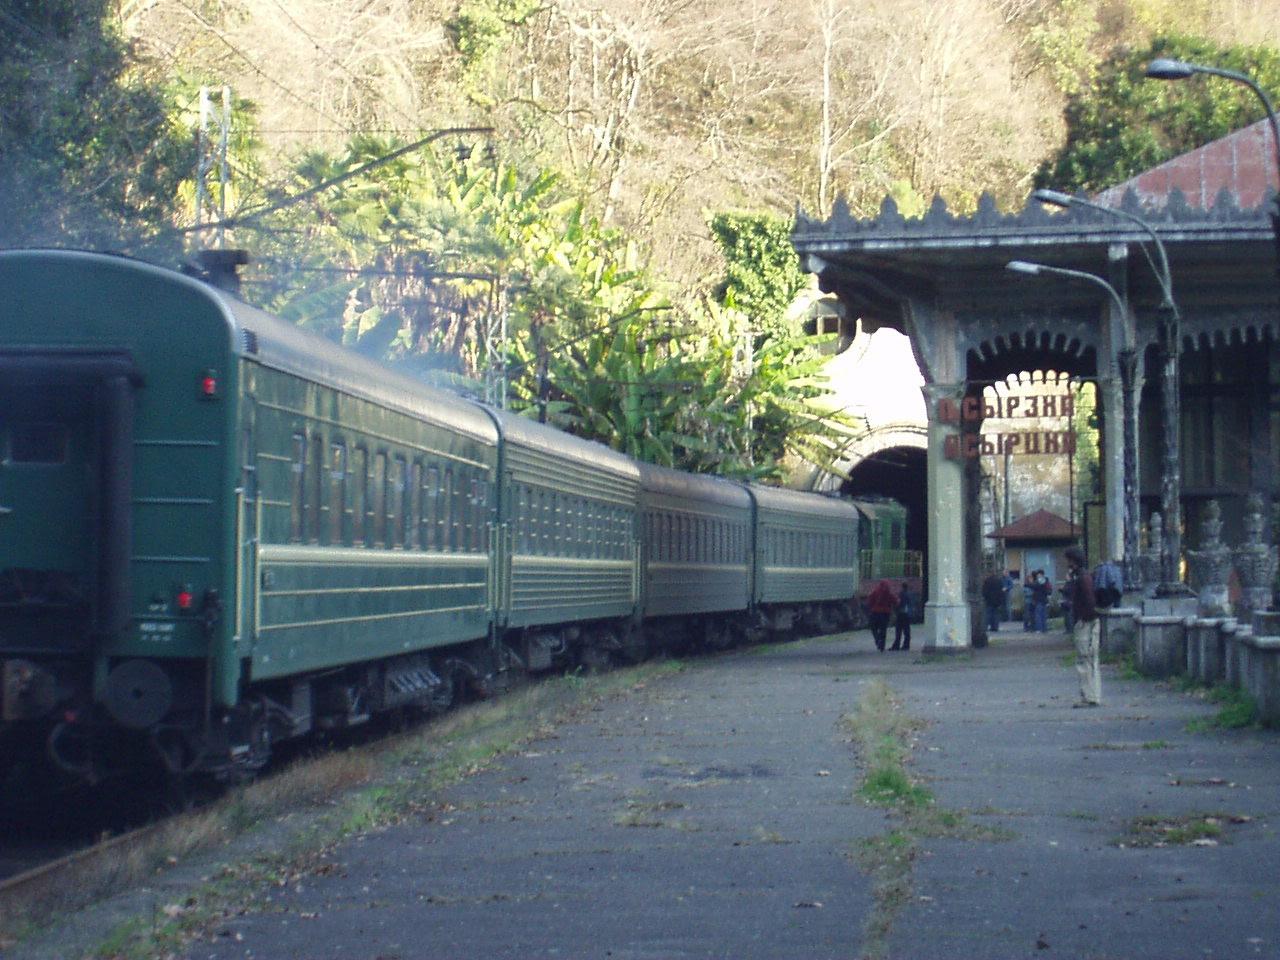 http://upload.wikimedia.org/wikipedia/commons/c/c6/Passenger_train_in_Psyrtskha,_Abkhazia.JPG